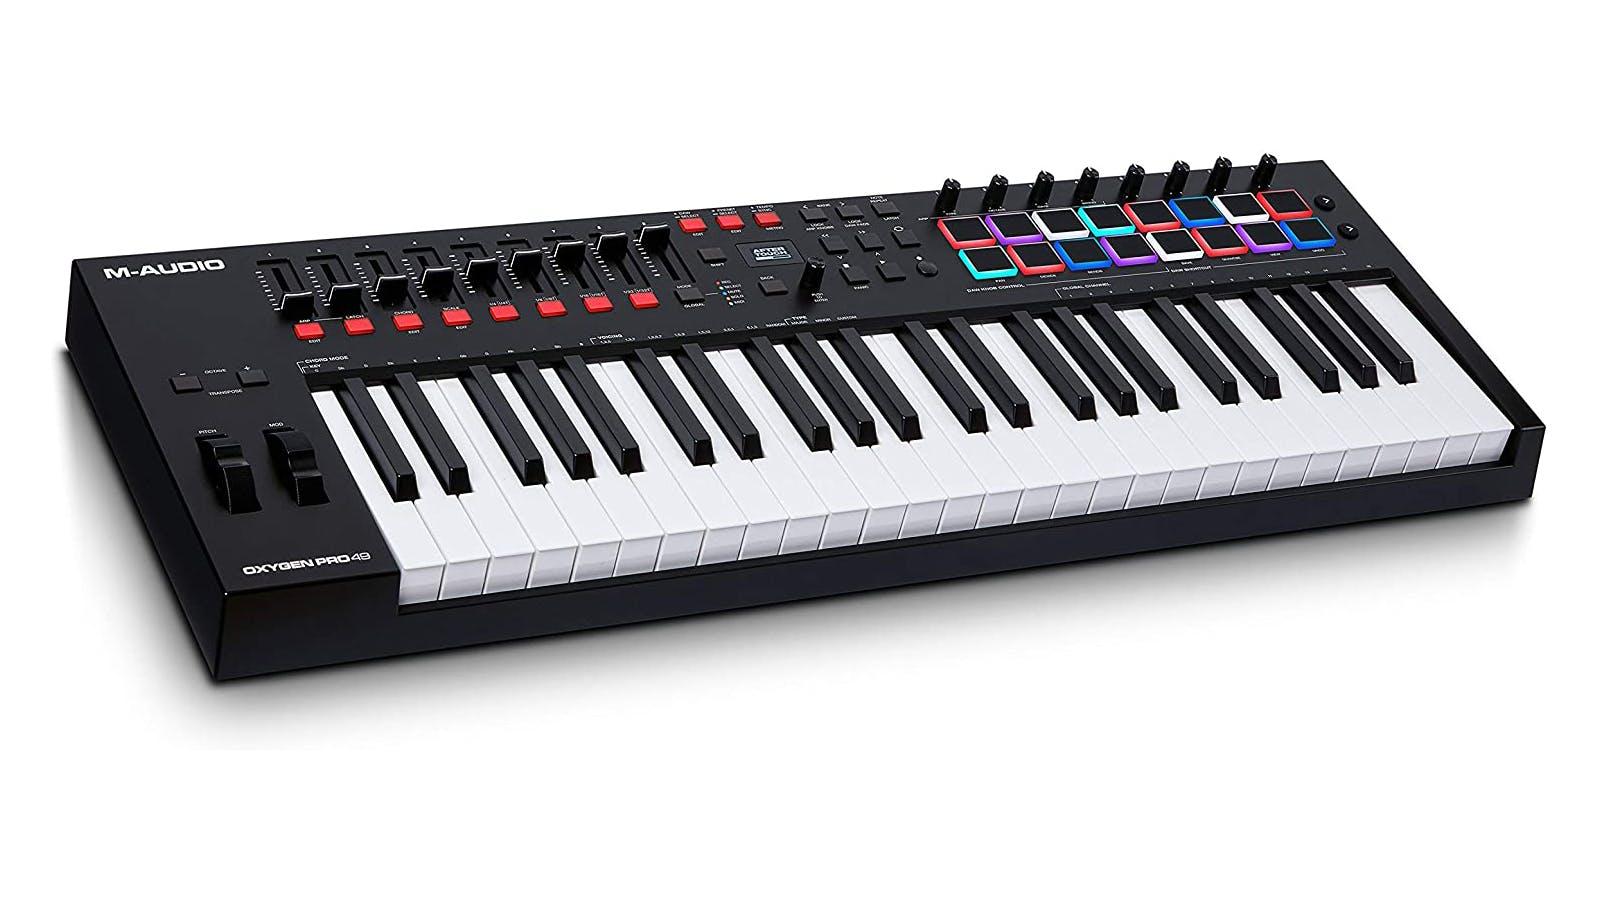 M-Audio Oxygen Pro (49-key) MIDI keyboard